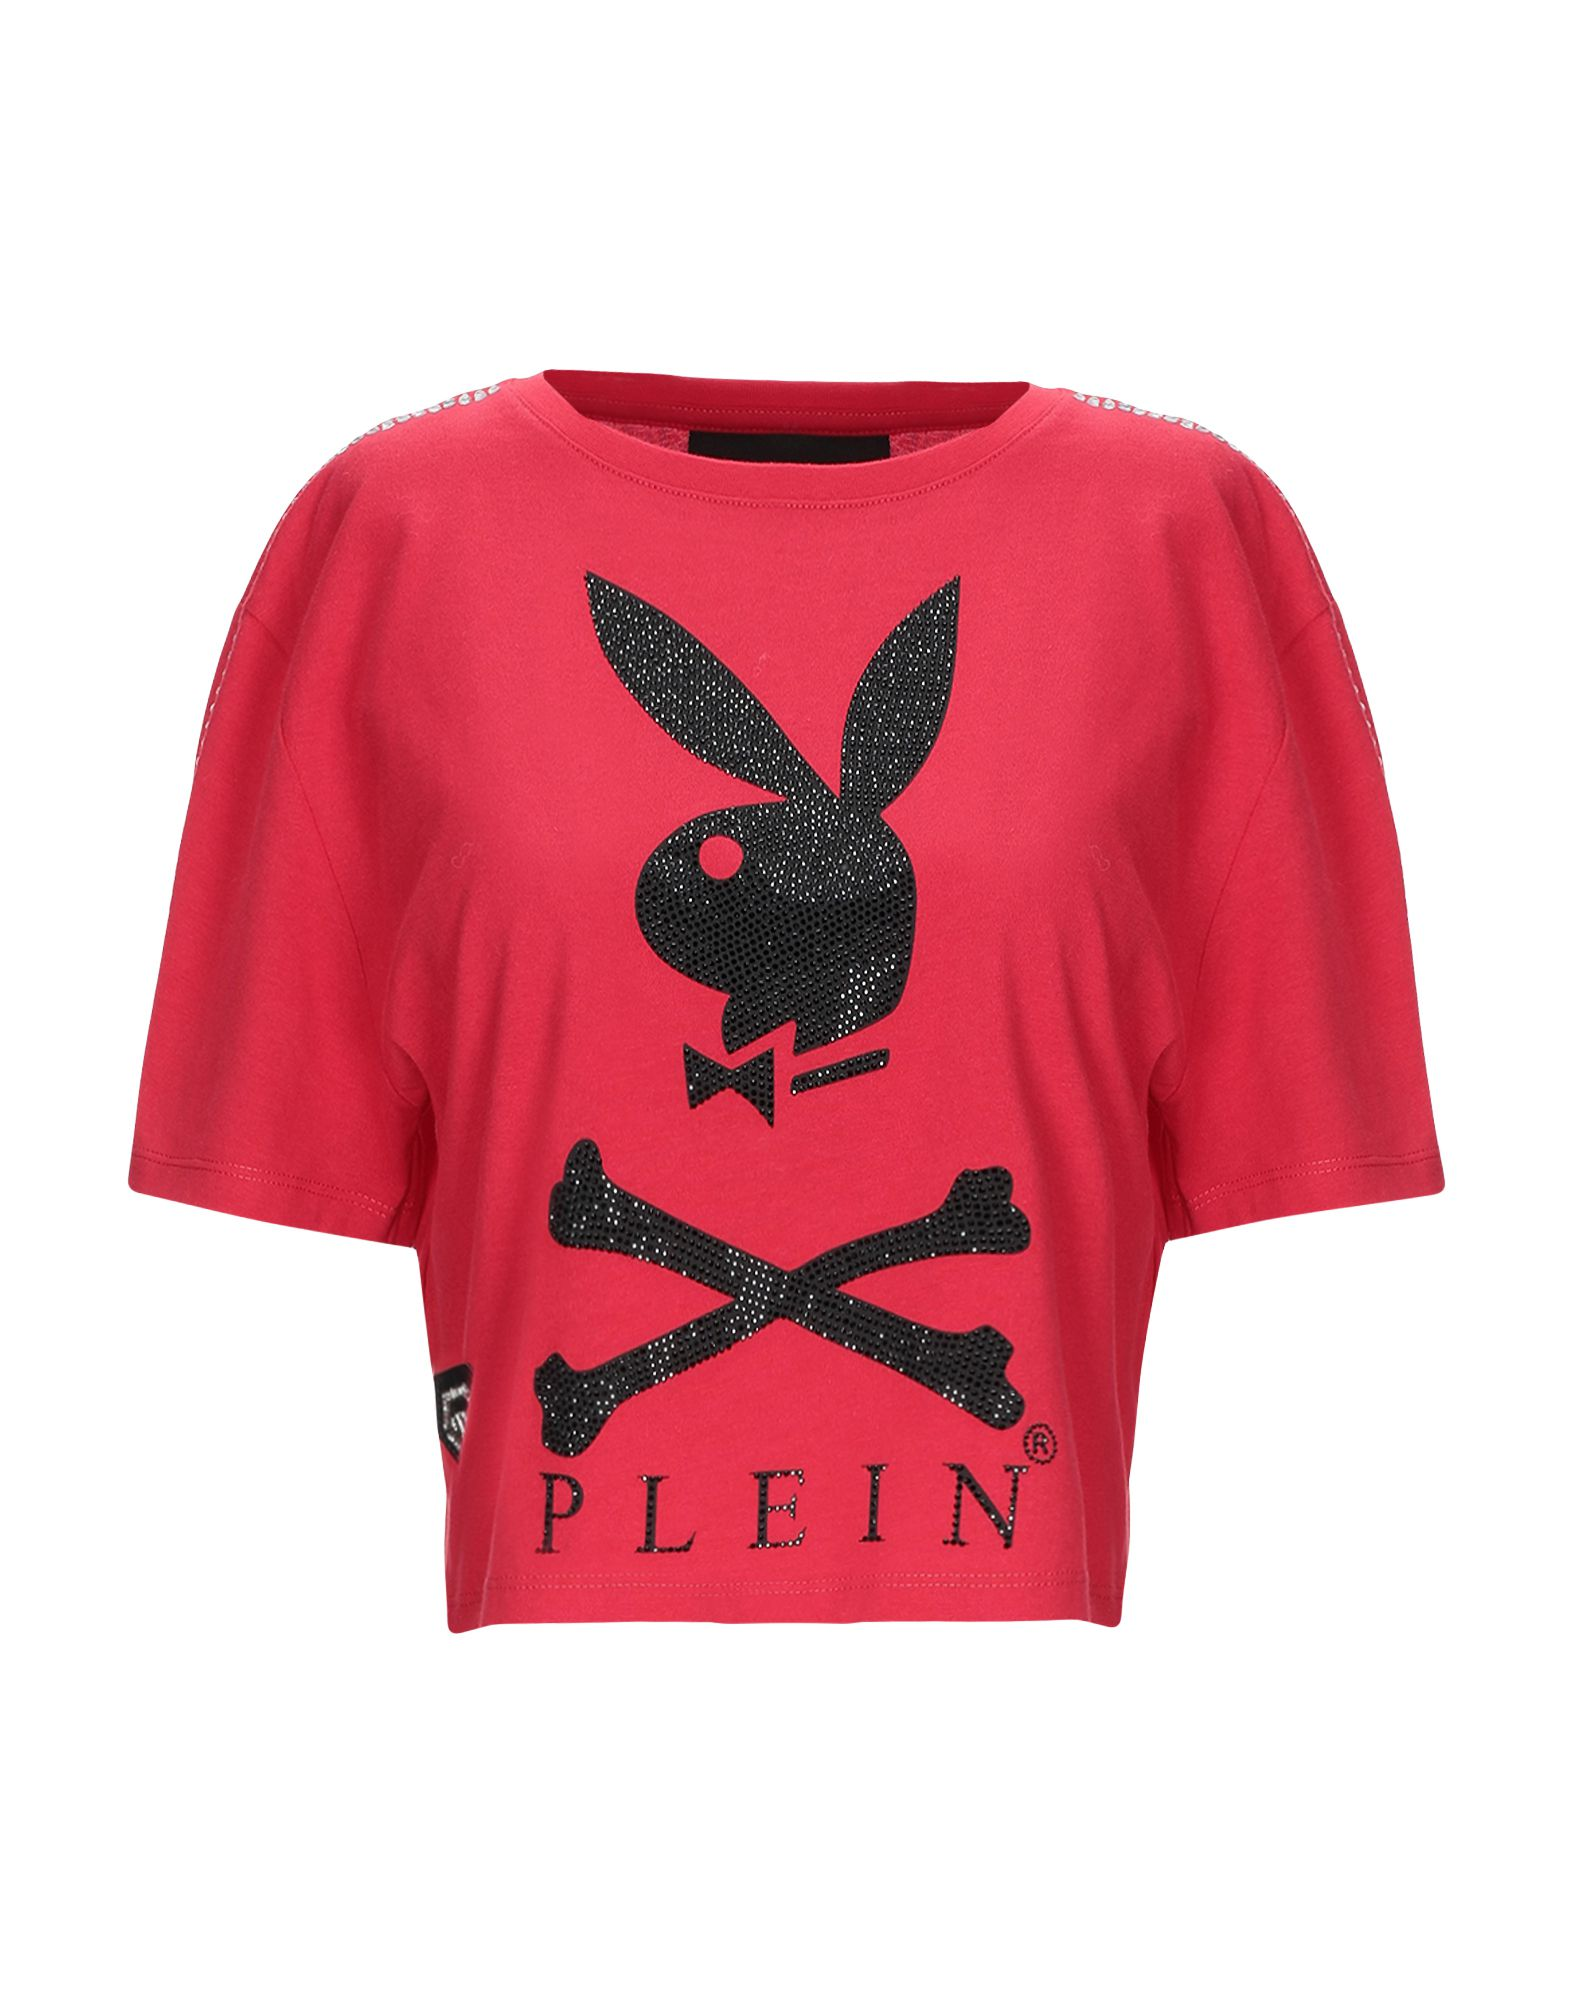 T-Shirt T-Shirt T-Shirt Philipp Plein X Playboy donna - 12336969FM 0d5